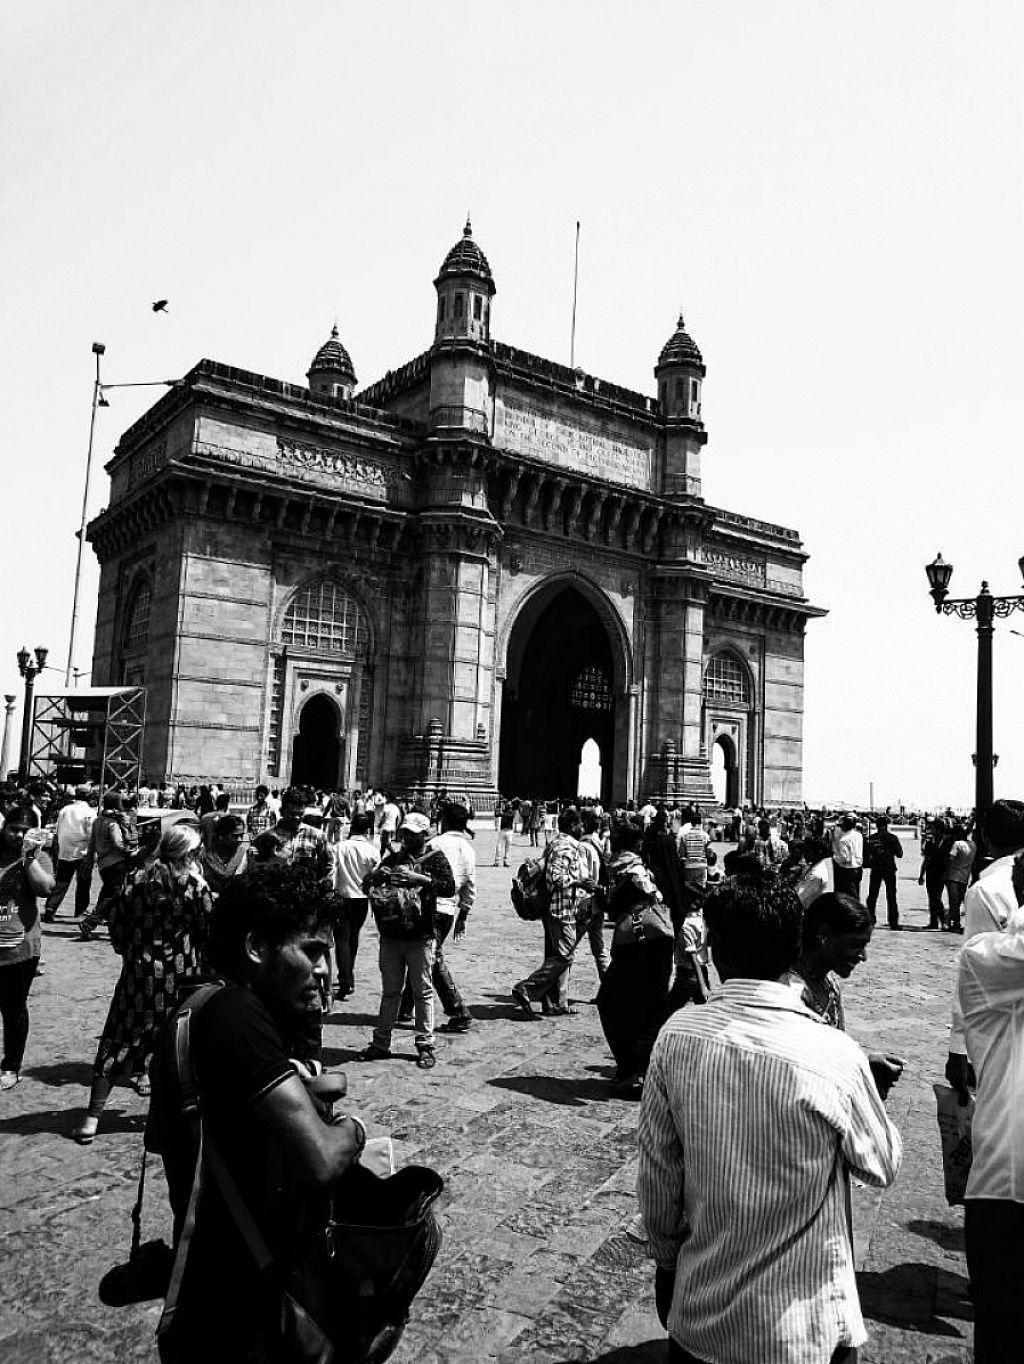 Gate way of India. #Mumbai #india #IncredibleIndia # ...